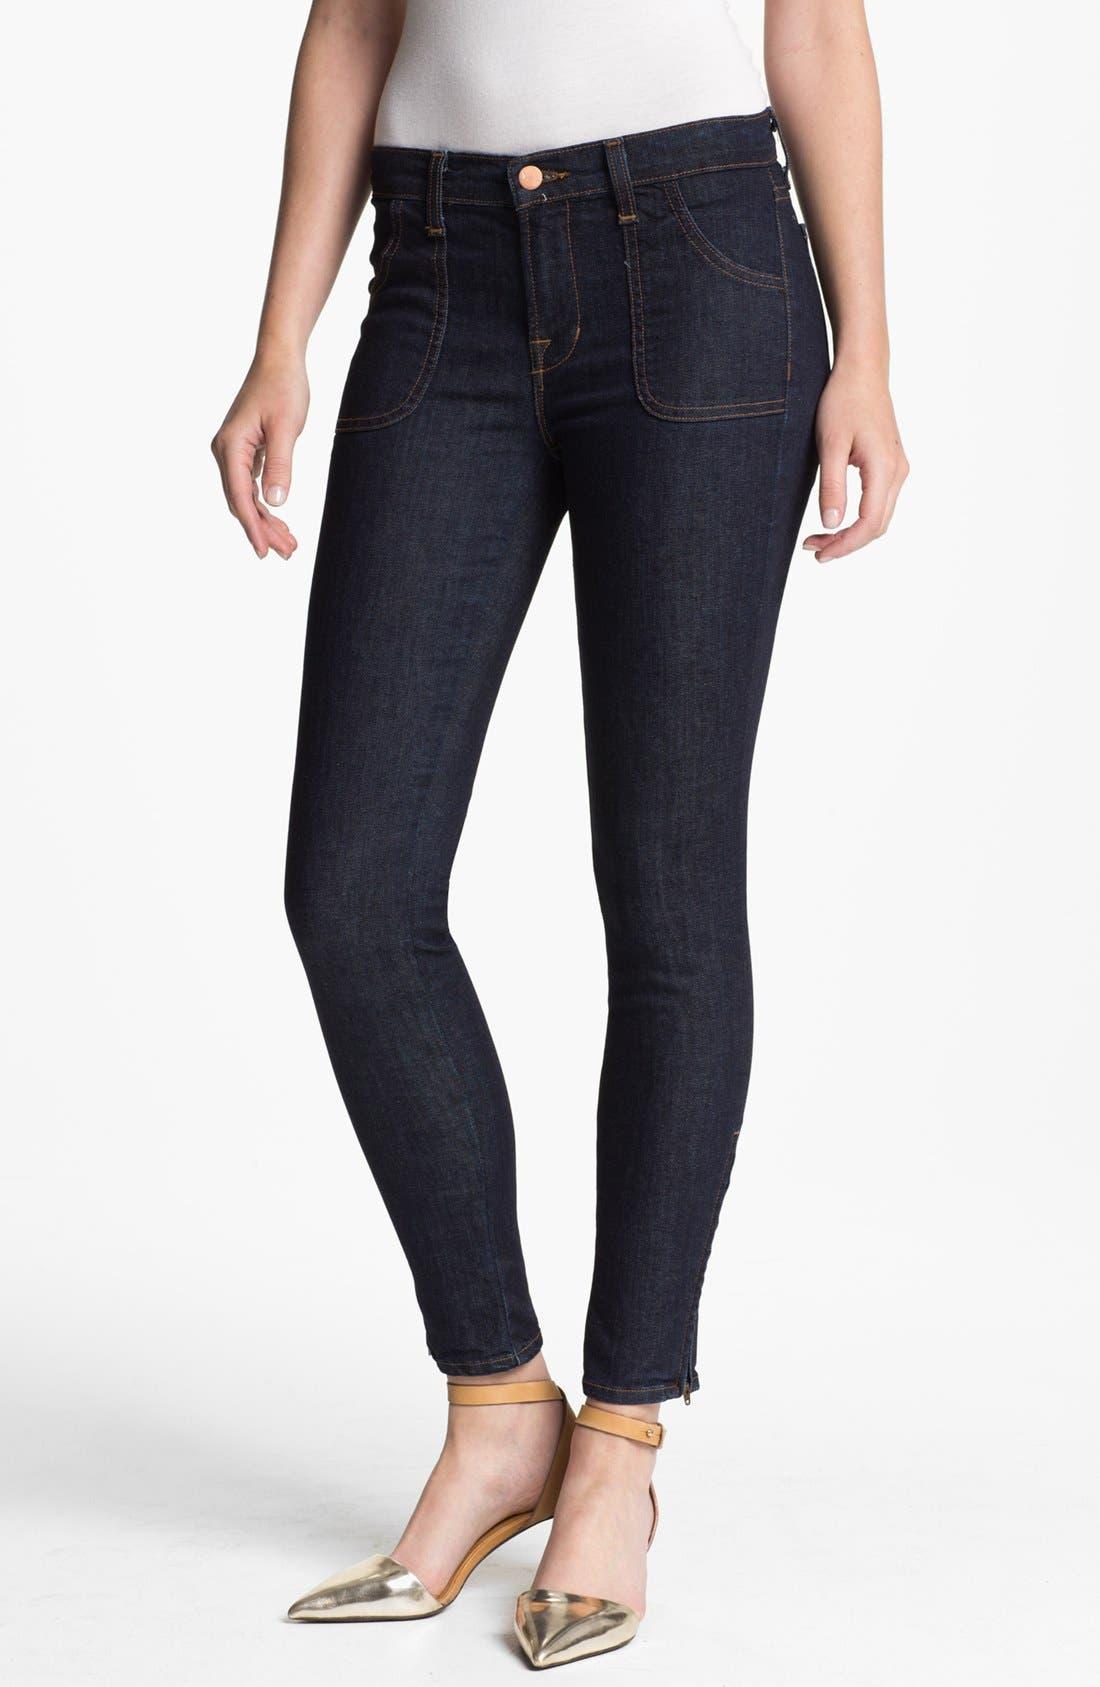 Main Image - J Brand 'Retro' Skinny Ankle Zip Jeans (Clean Rinse)